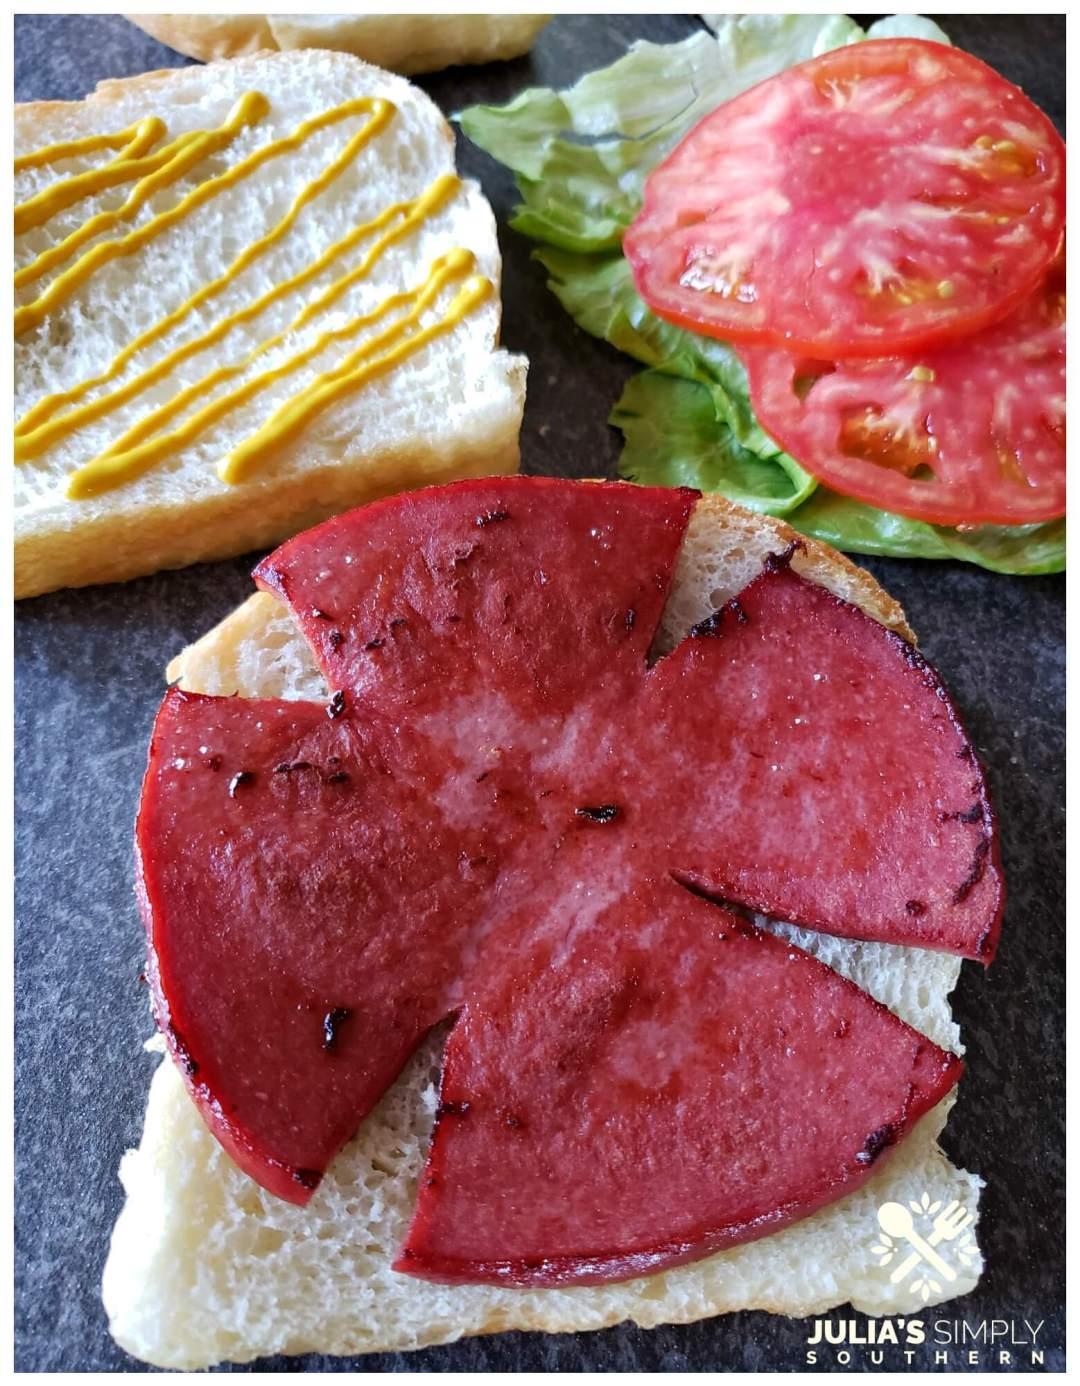 Homemade fried bologna sandwiches